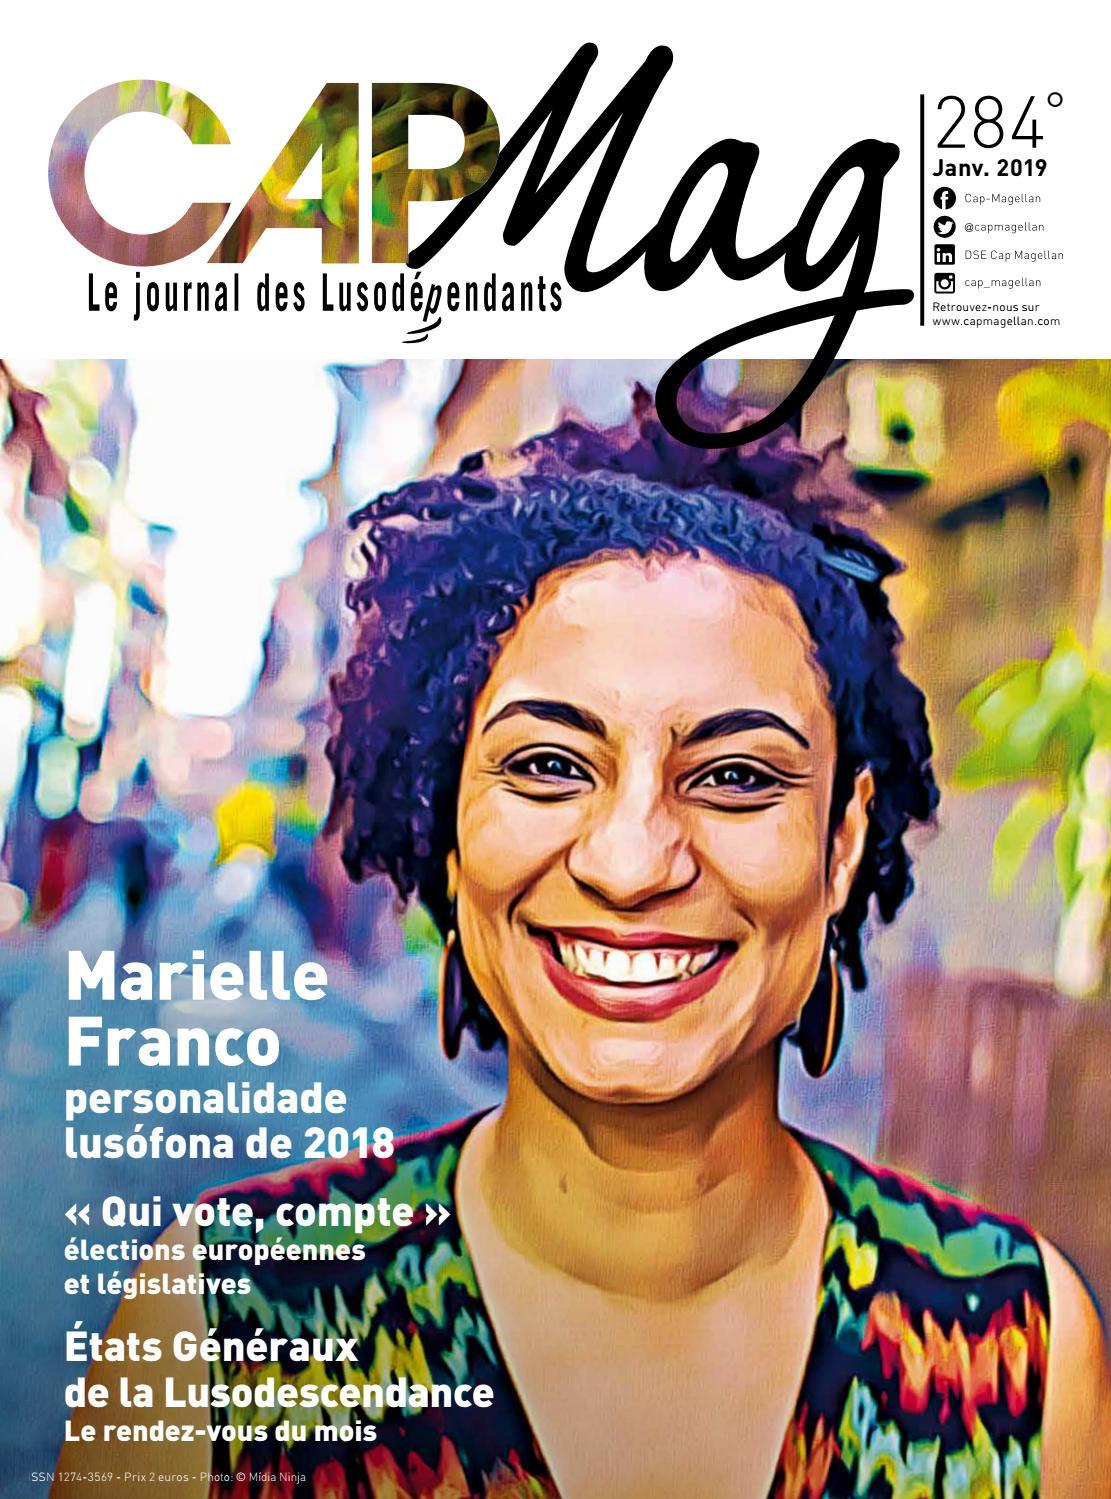 rencontres Ariane jogo en ligne mars attaques profil de rencontre